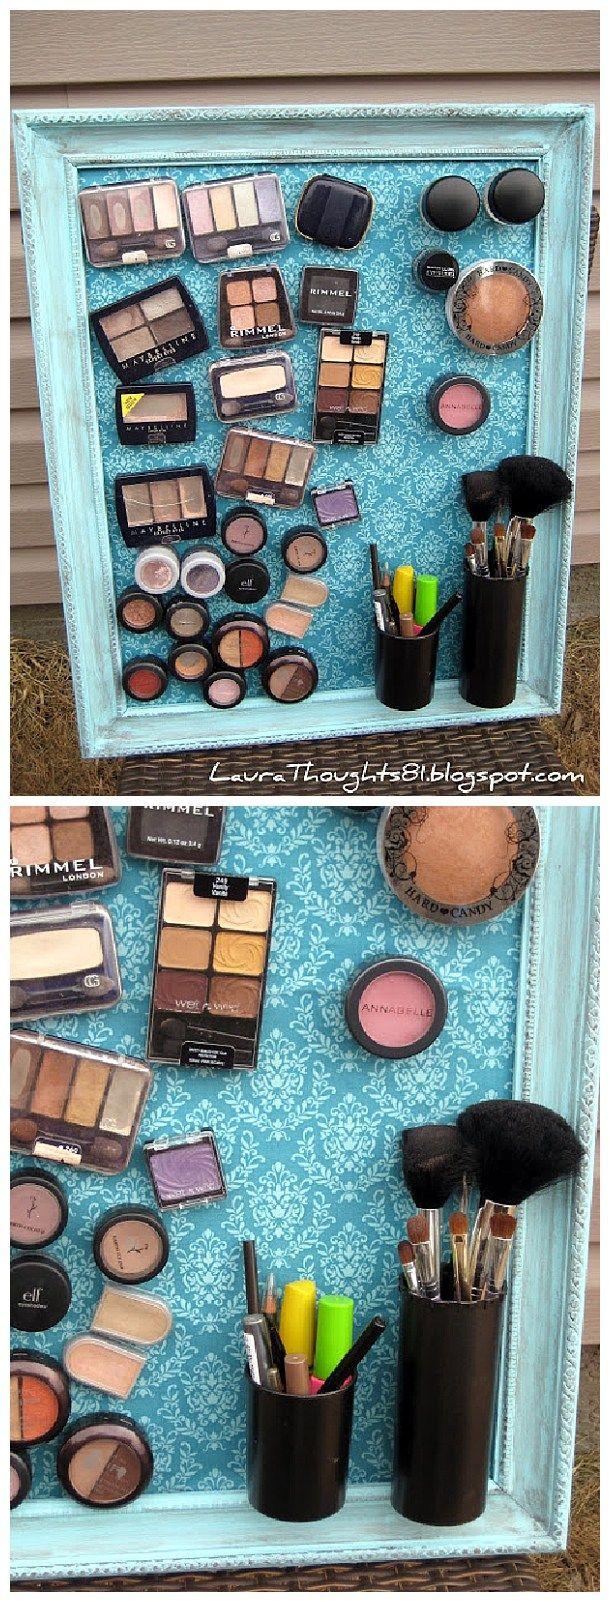 DIY Bathroom Organizer Ideas - DIY Magnetic Makeup and Beauty Tools Decorative S...